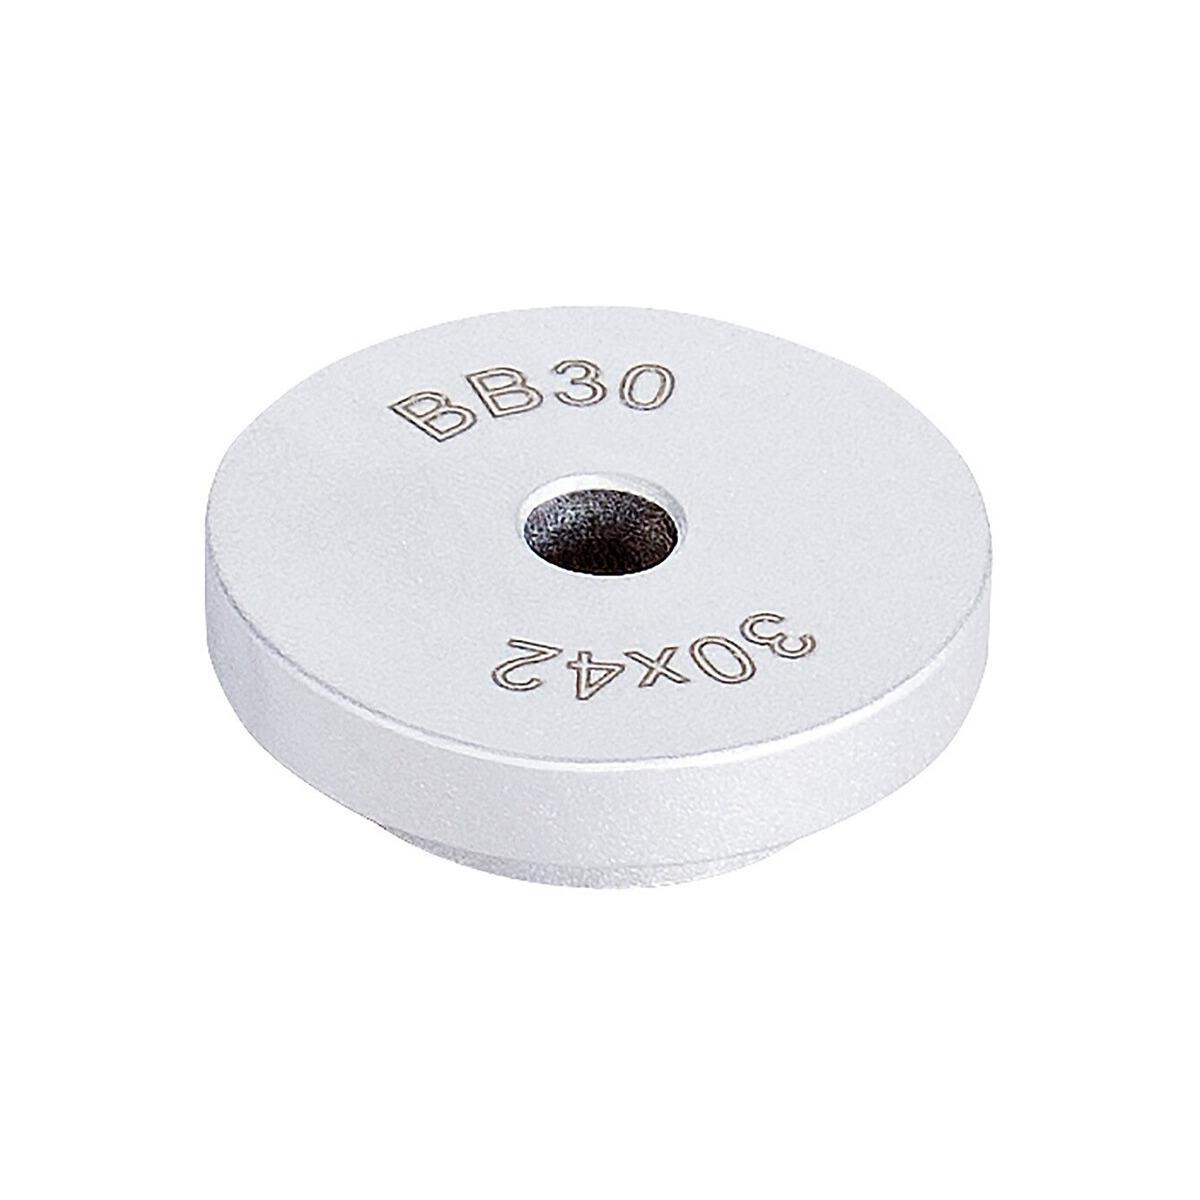 Bearing Press 1721 Adaptor 30x42 BB30 1721.1 2pcs